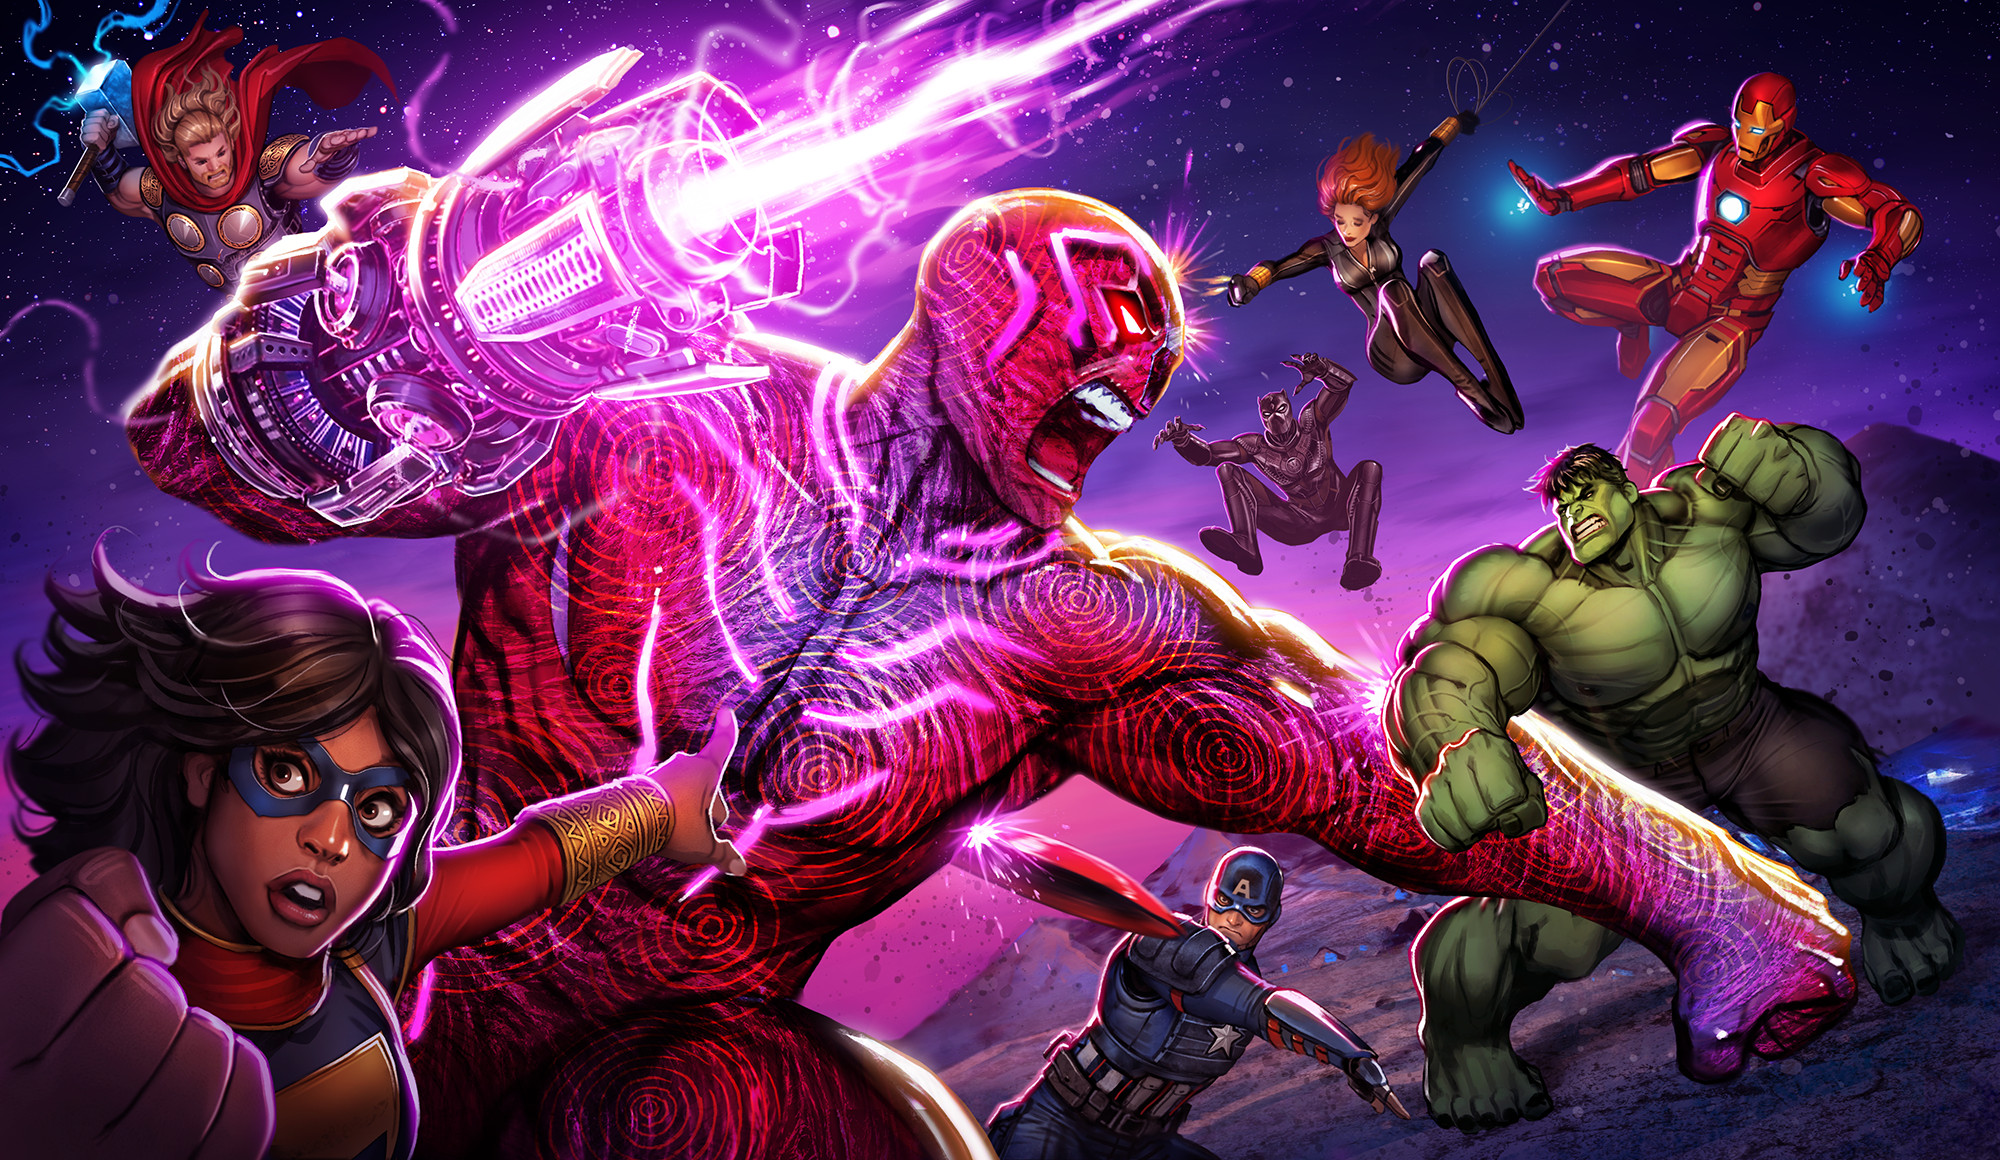 Scene 7 (Final): Avengers and Black Panther vs. Klaw